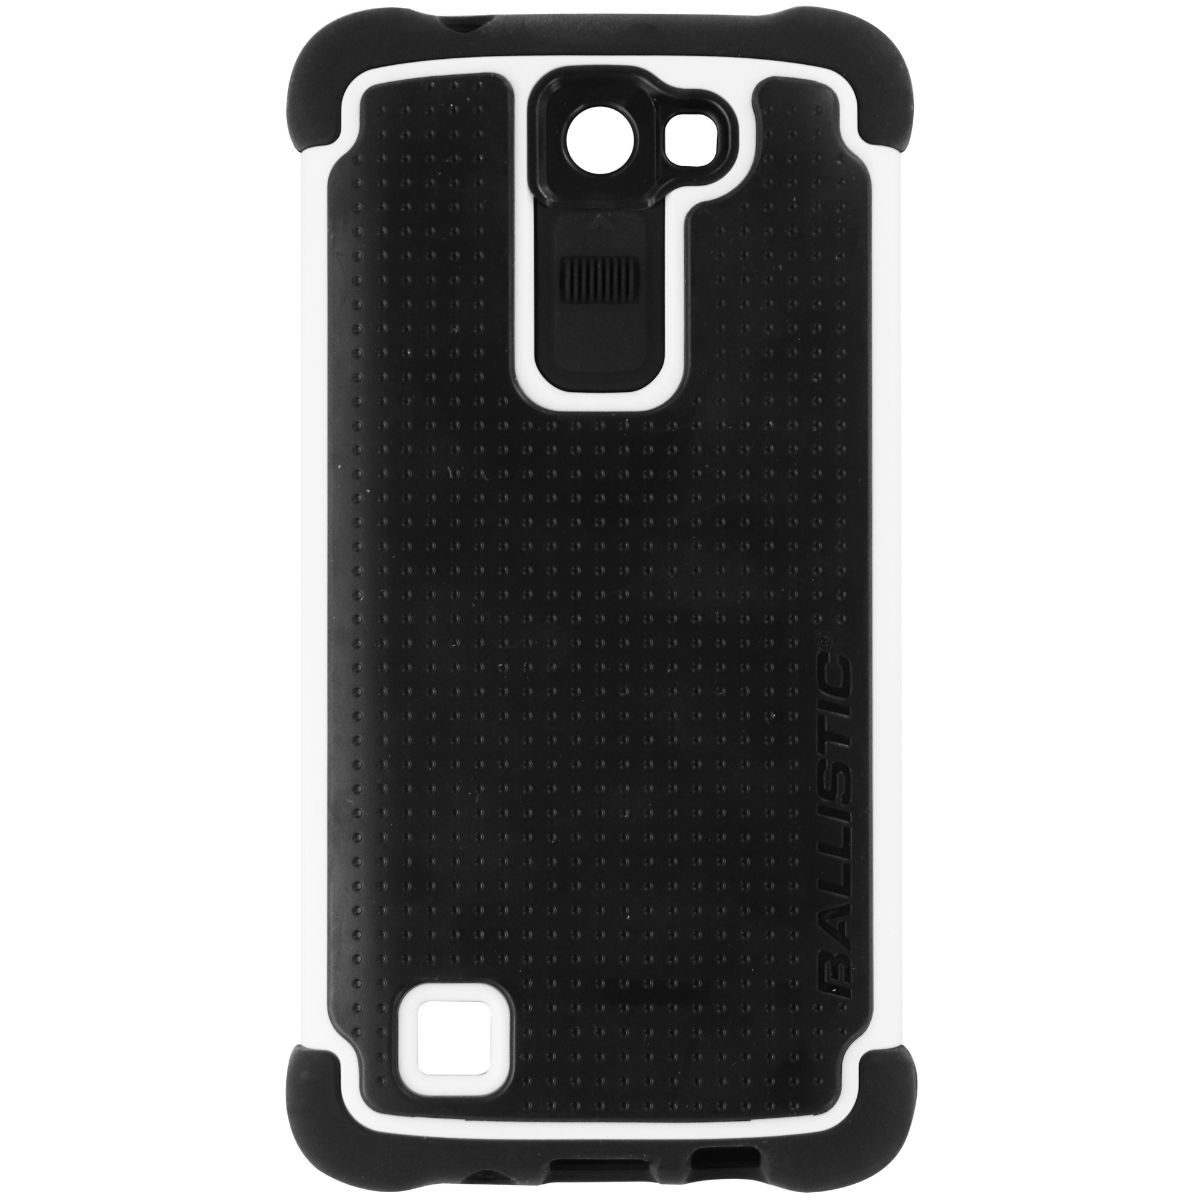 Ballistic Tough Jacket Series Dual Layer Case Cover for LG K8 - Black / White